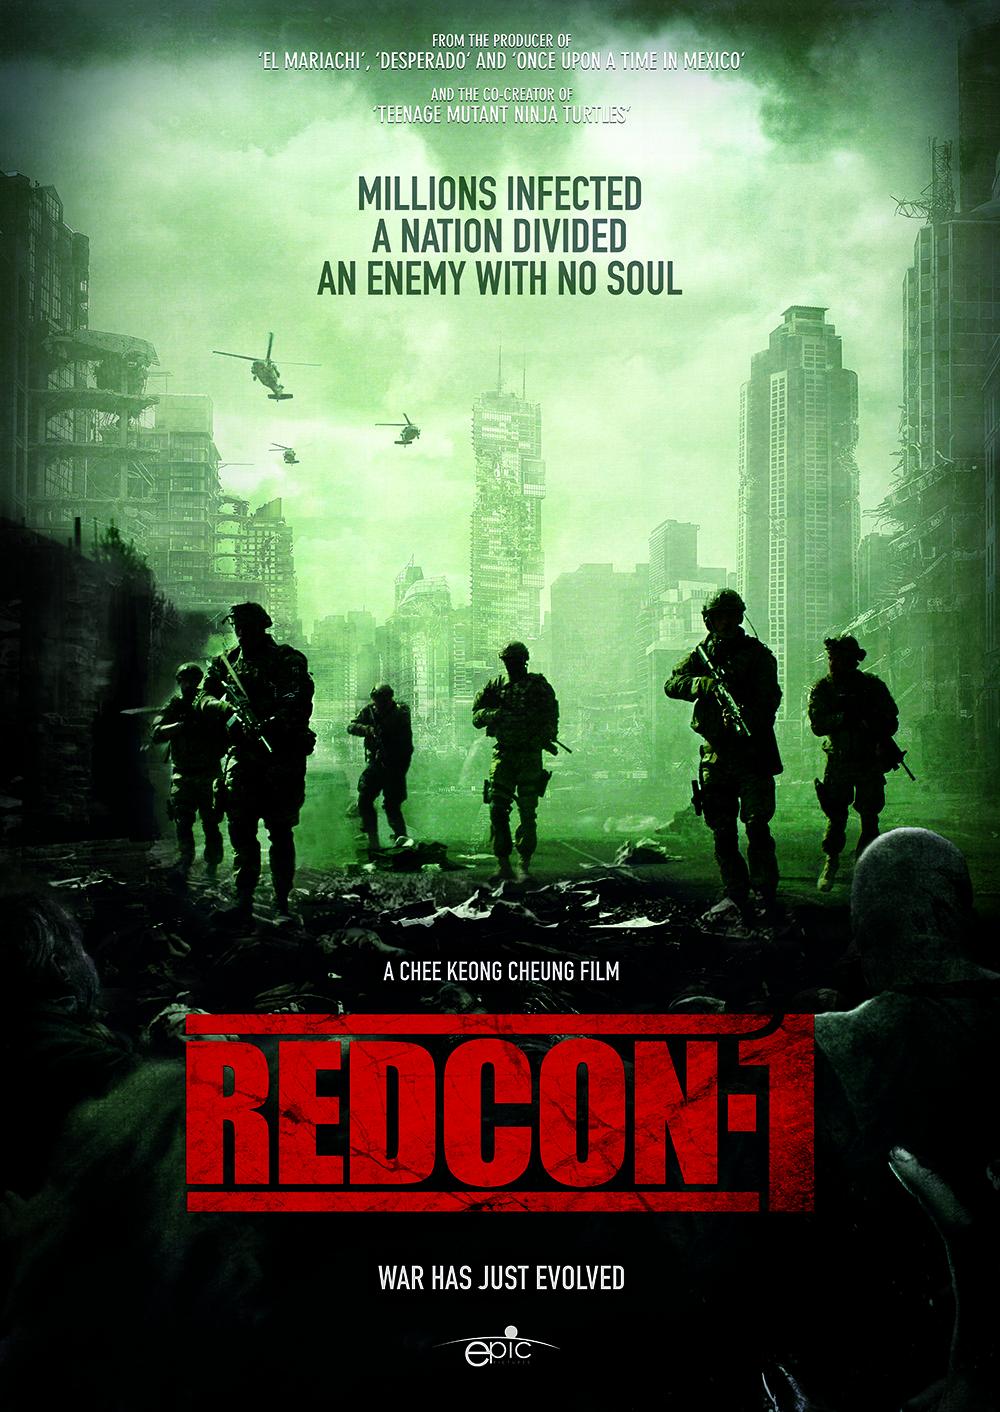 REDCON-1-poster-hi-res_flat-FINAL.jpg